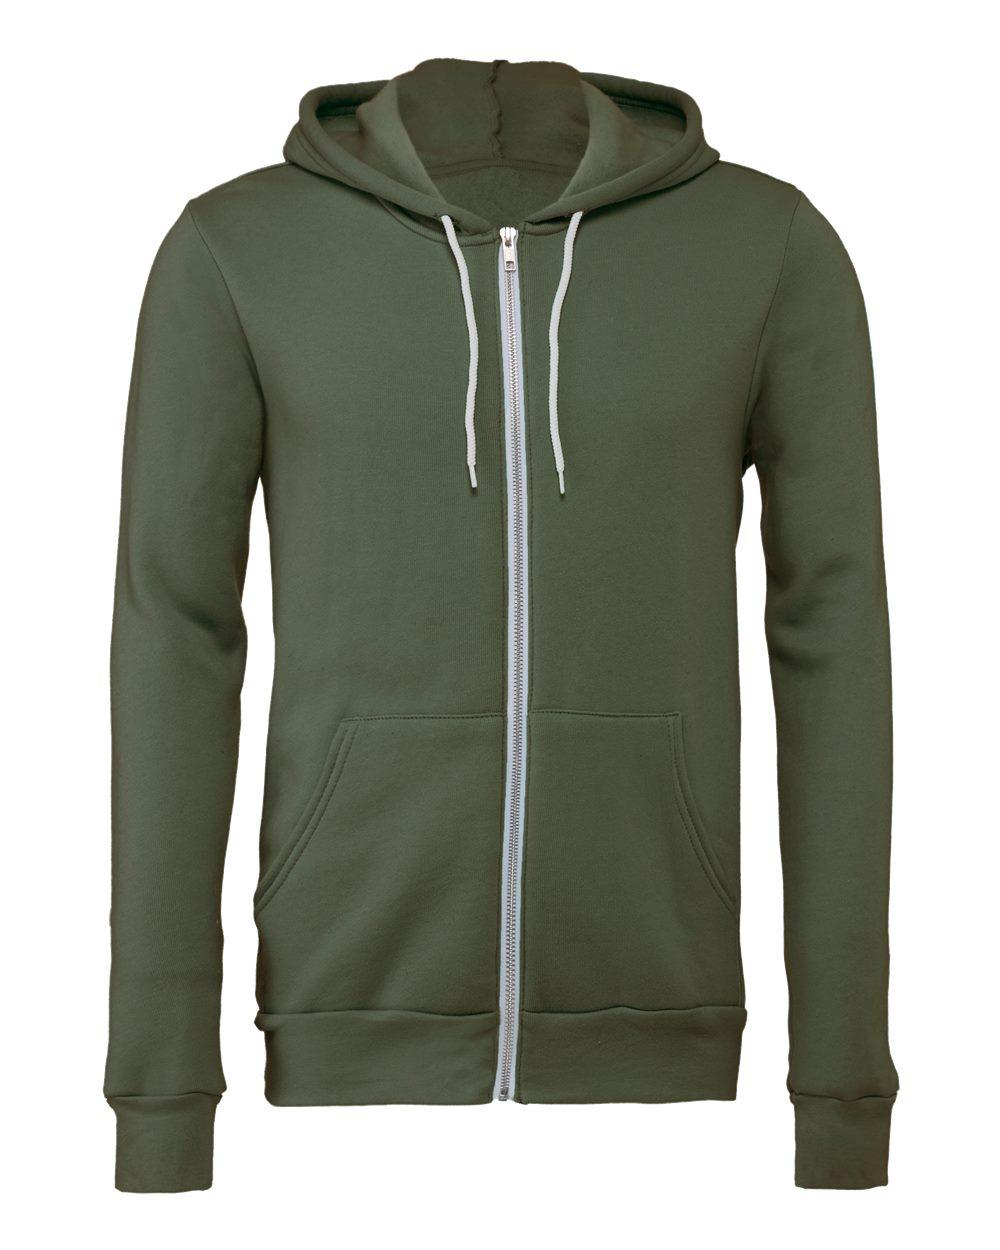 Bella-Canvas-Unisex-Full-Zip-Up-Hooded-Sweatshirt-Blank-Hoodie-3739-up-to-3XL thumbnail 71